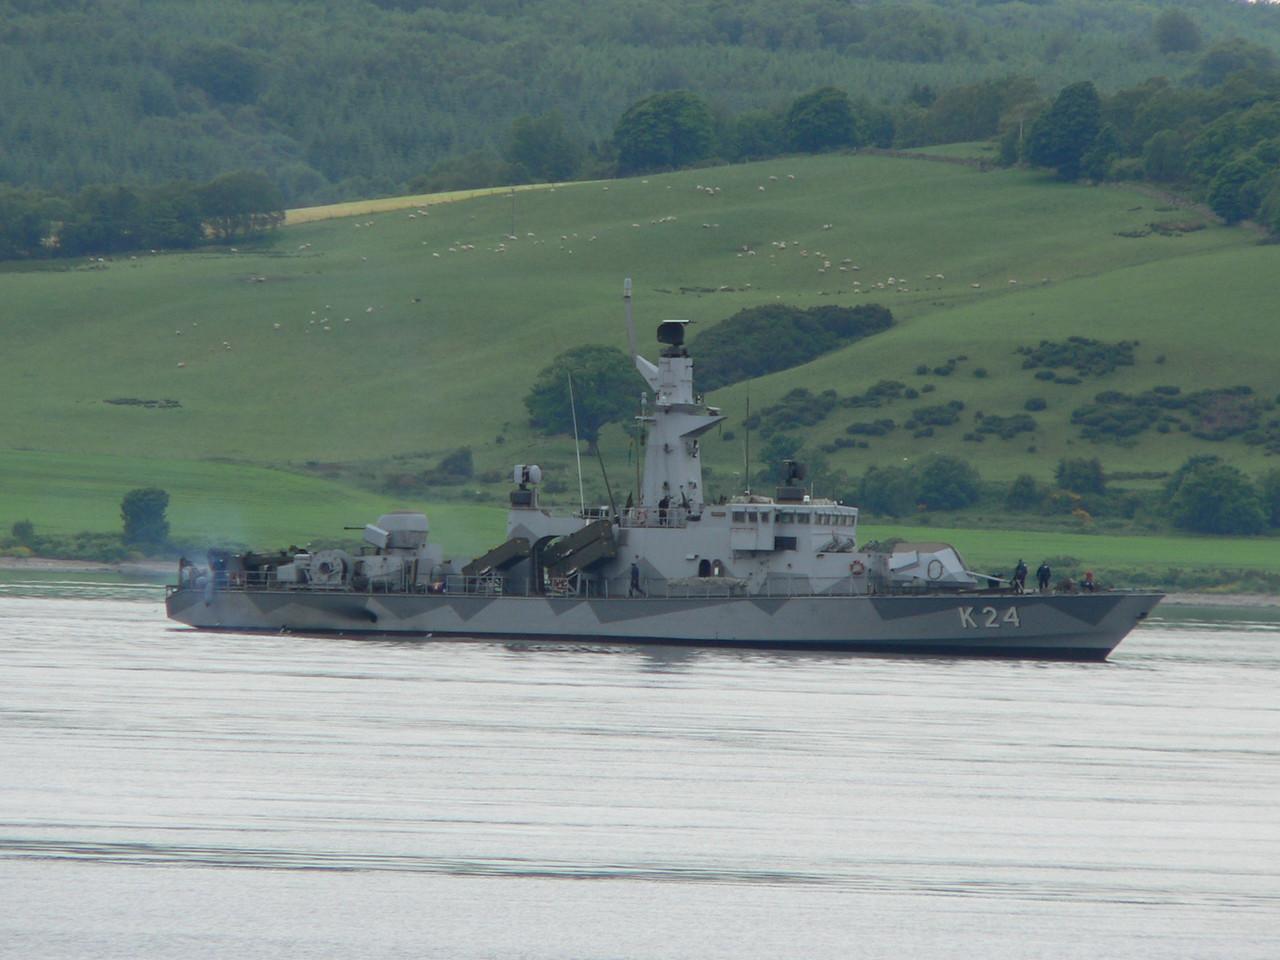 K-24 HMS SUNDSVALL